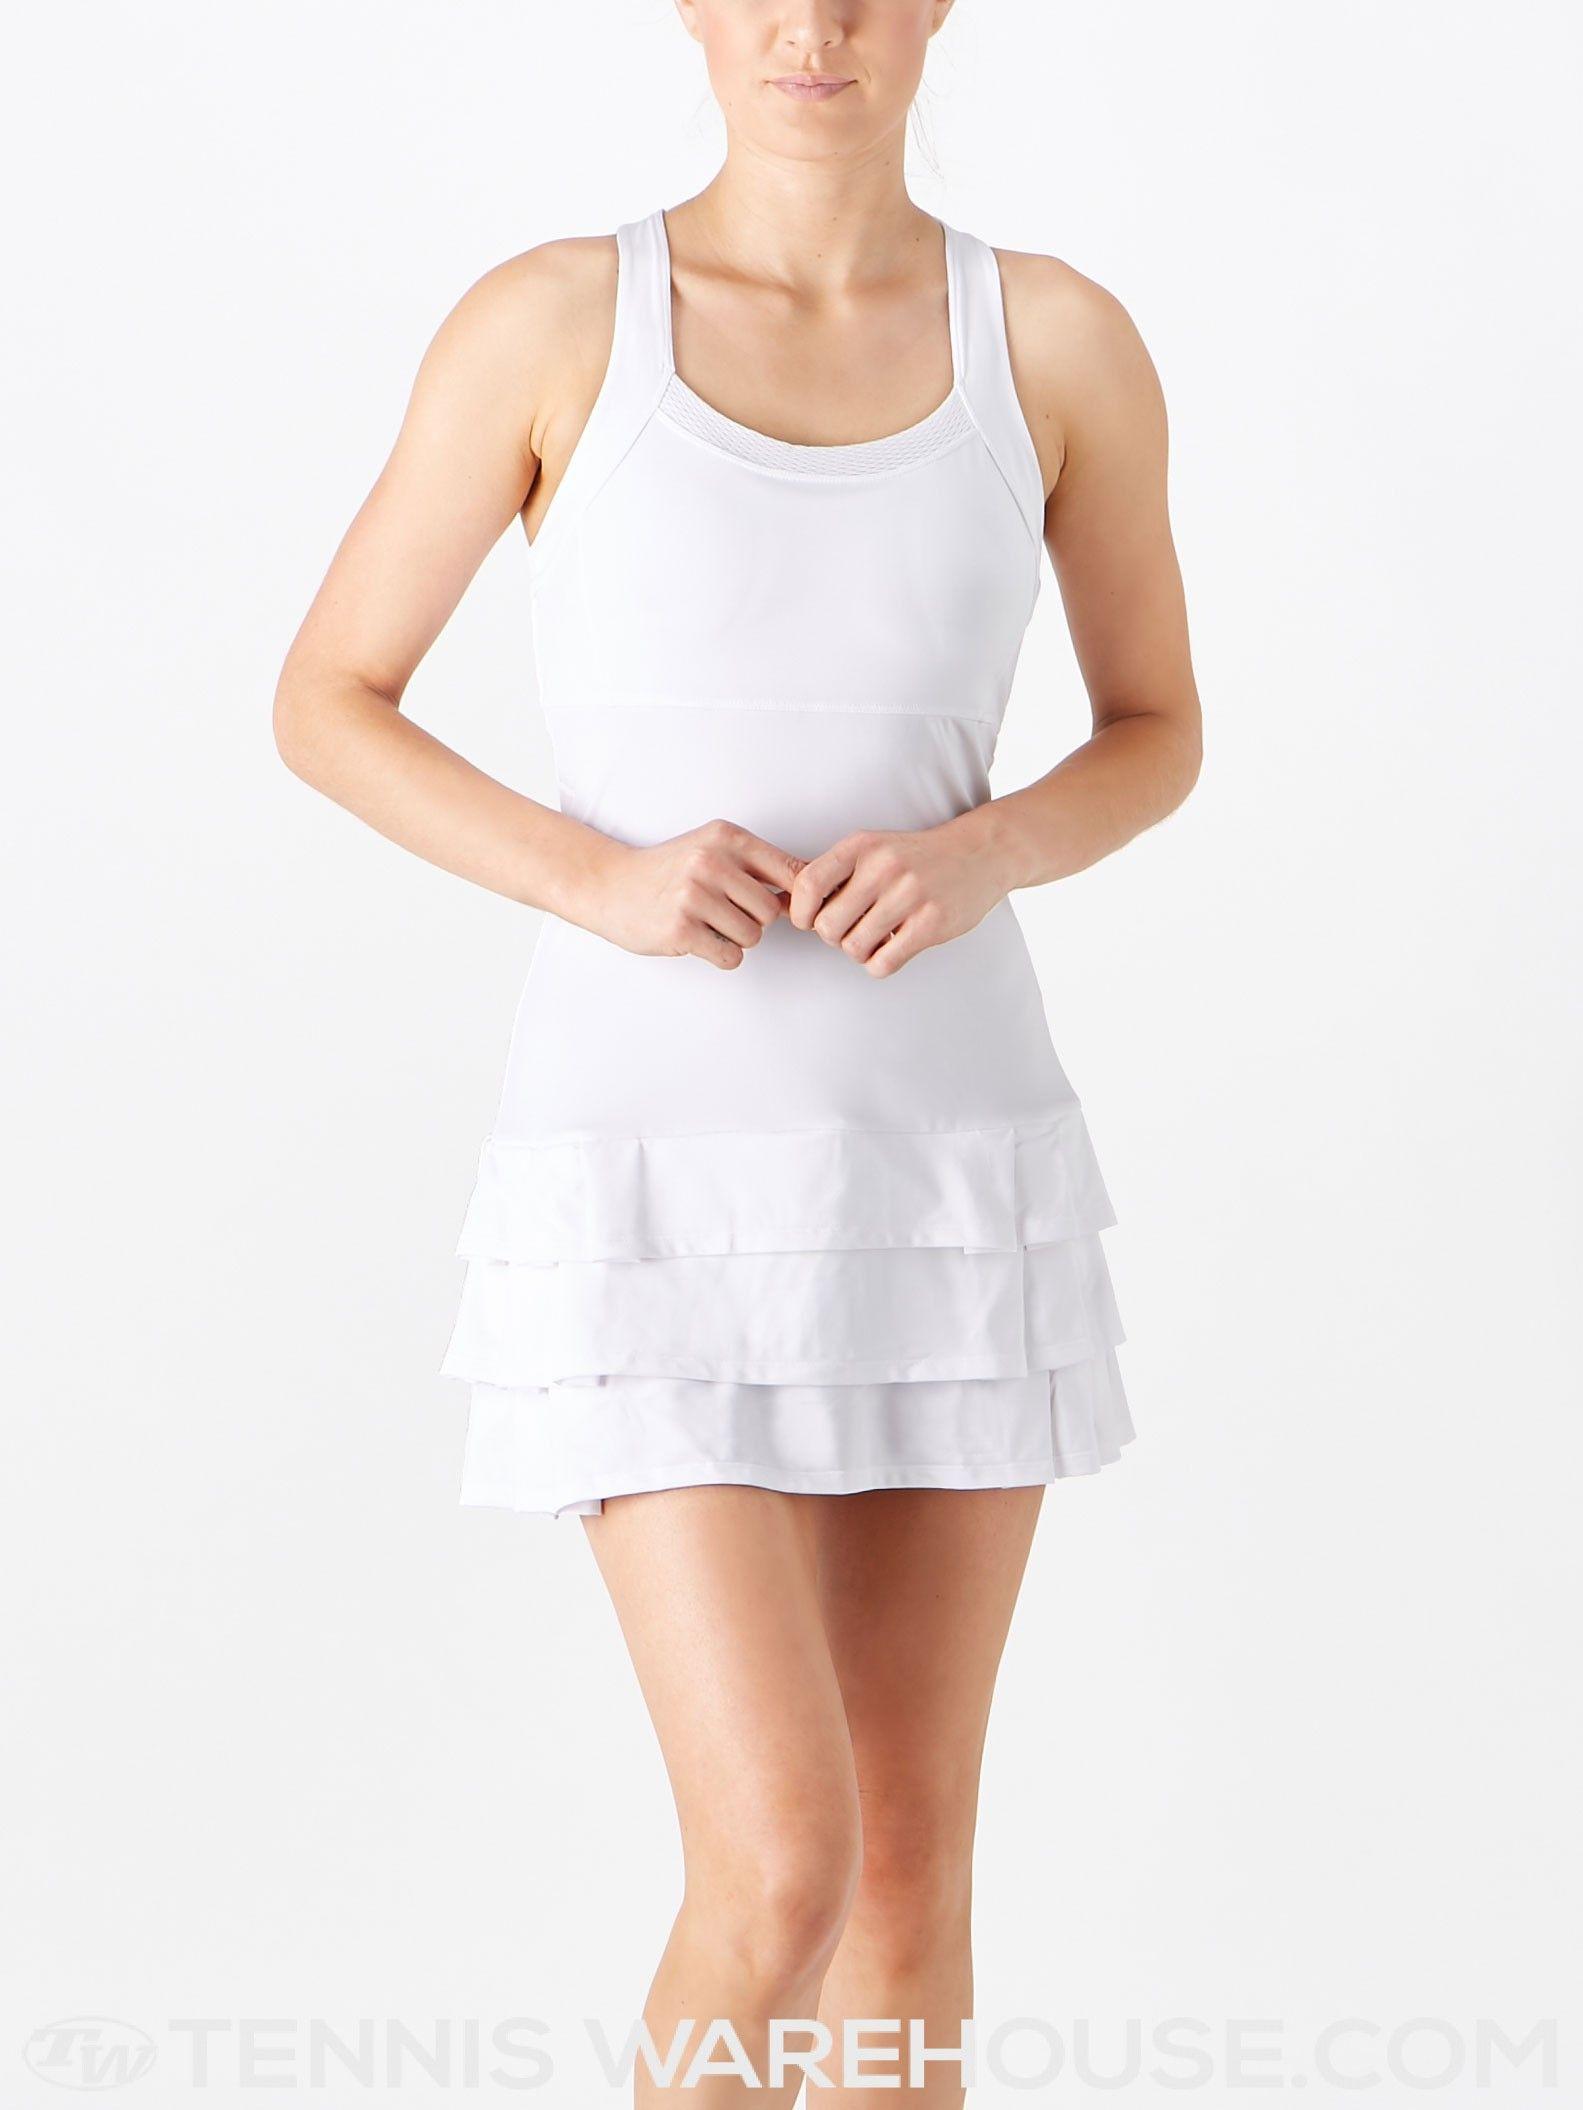 Pin By Tennis Warehouse On Women S Tennis Wear Fashion Stylish Outfits Fashion Tennis Wear